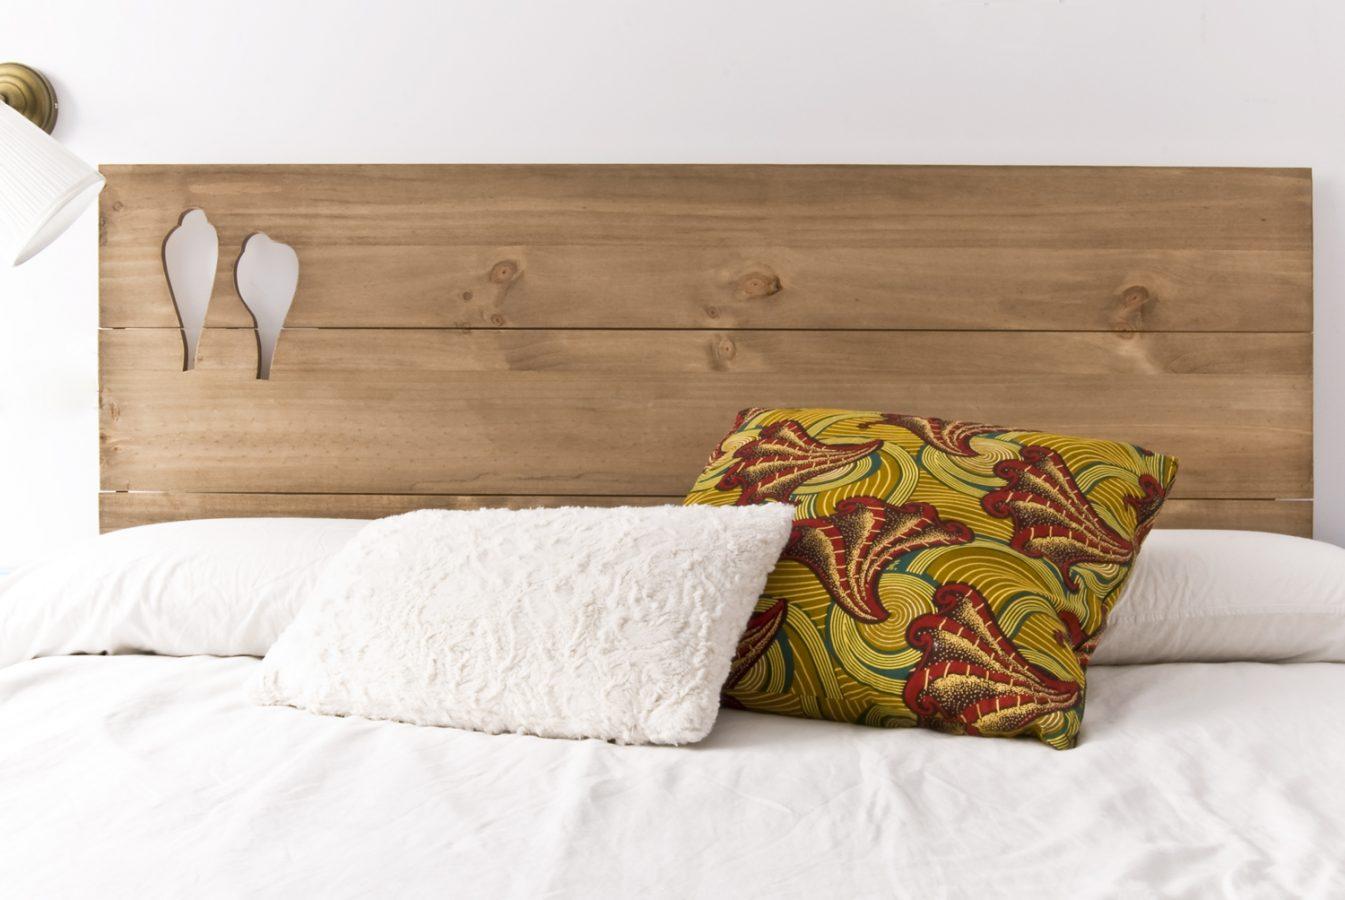 Cabecero blanco madera ideas de disenos - Cabecero blanco madera ...